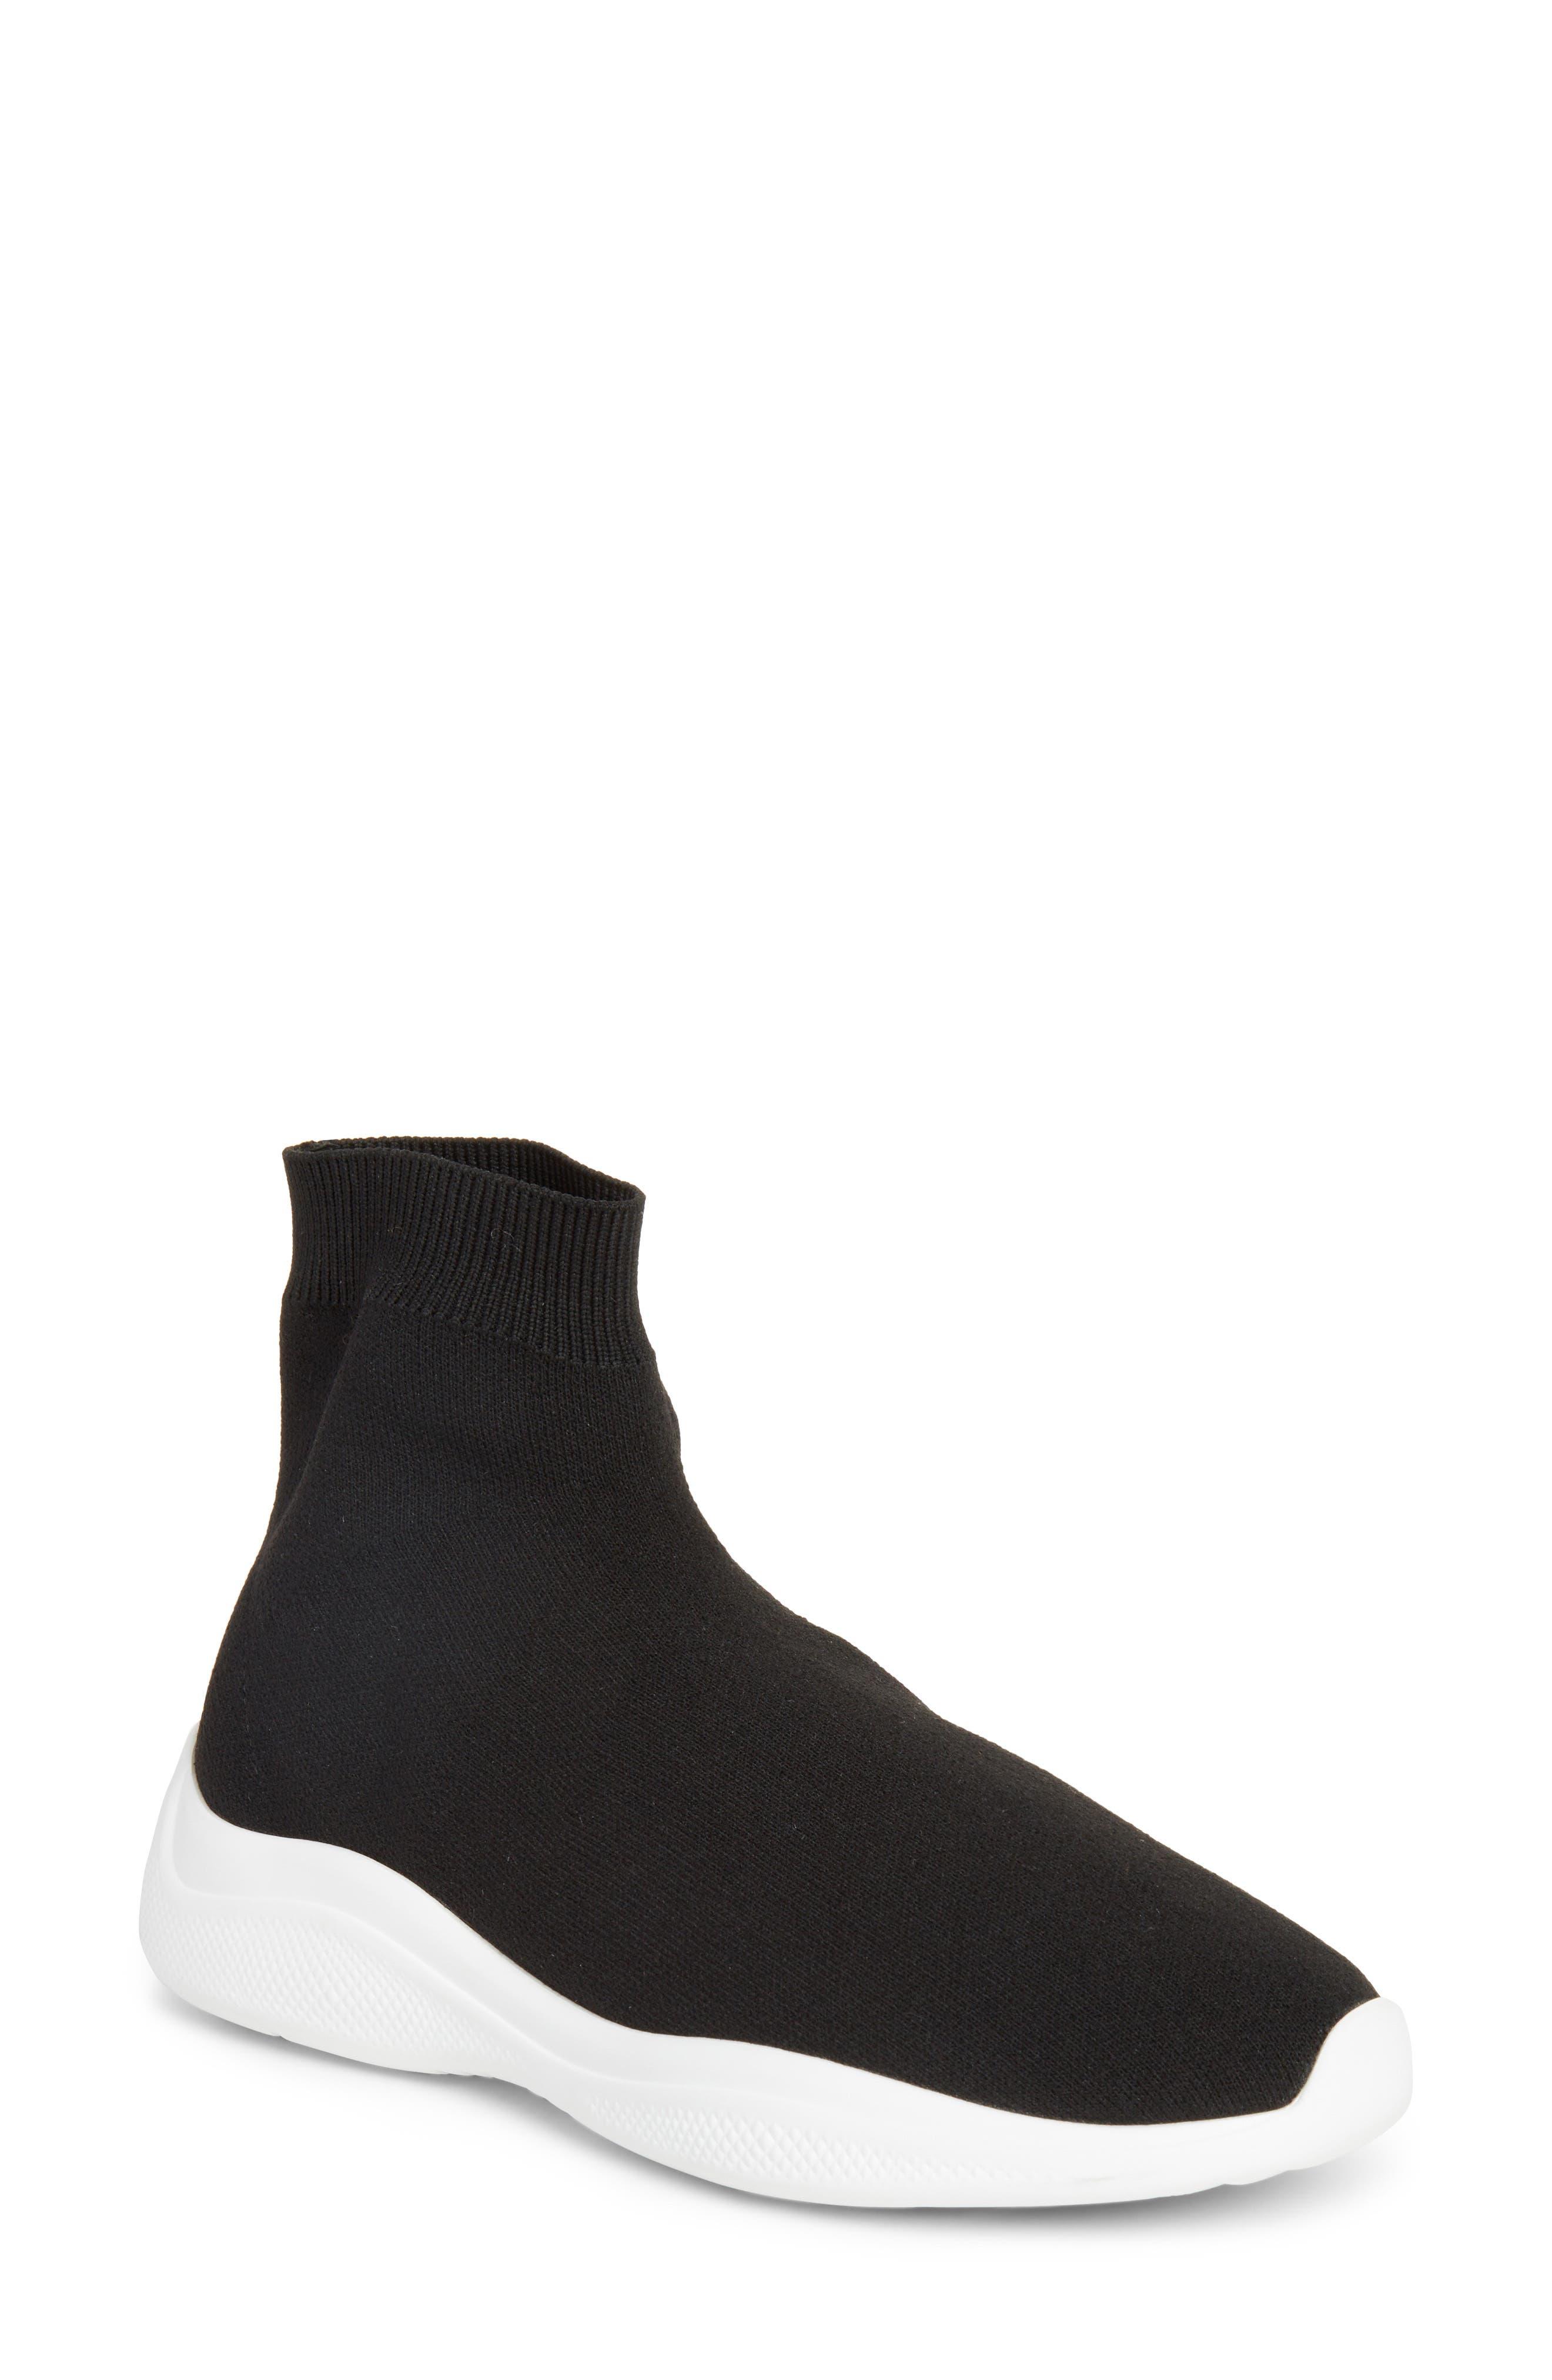 Prada Sock Sneaker (Women)